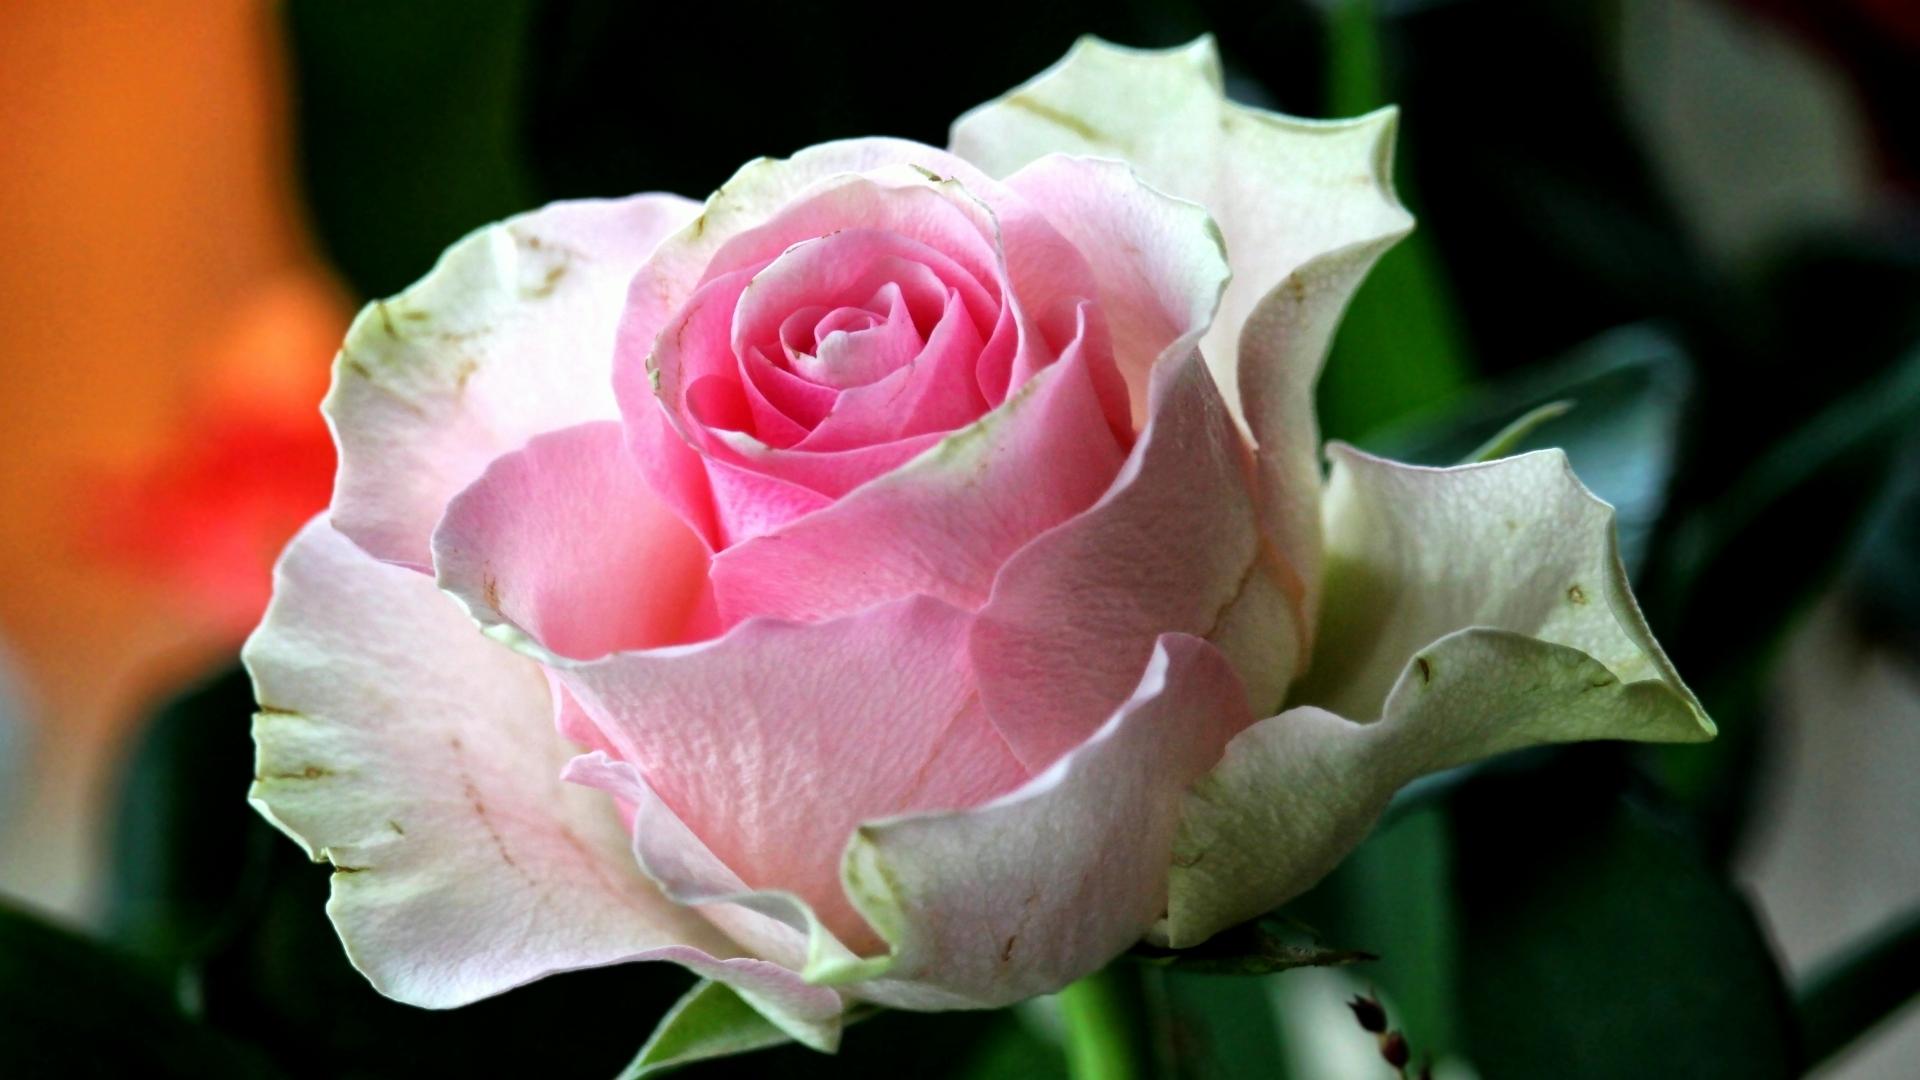 Schöne Rosenbilder Gratis